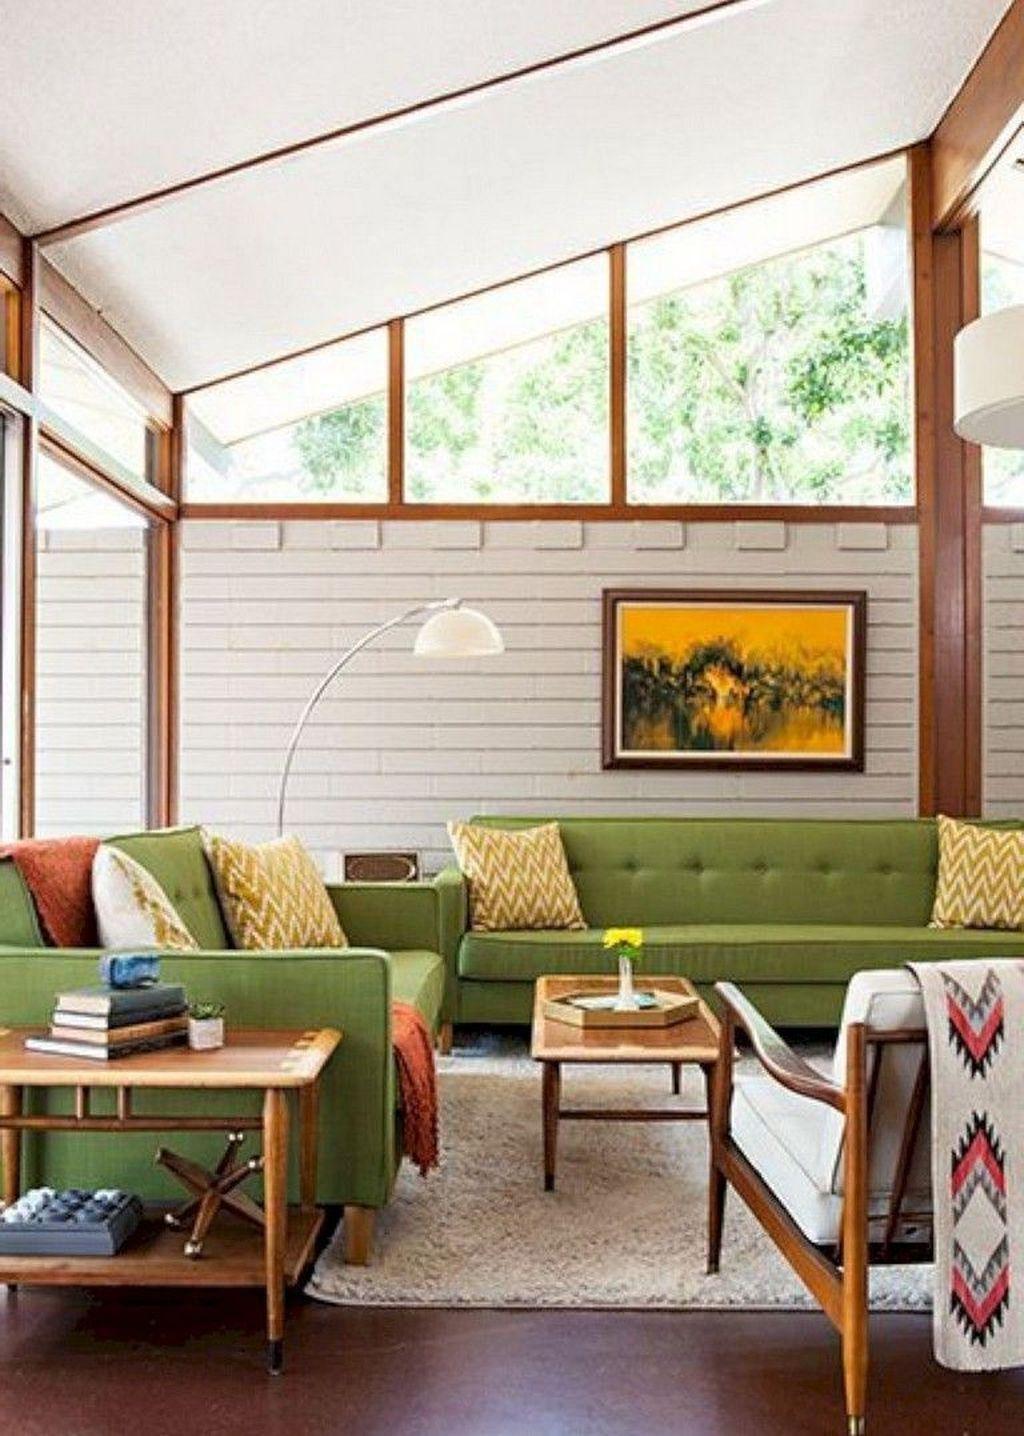 37 Inexpensive Retro Living Room Design Ideas On A Budget | Mid century  living room decor, Mid century modern living room, Mid century living room